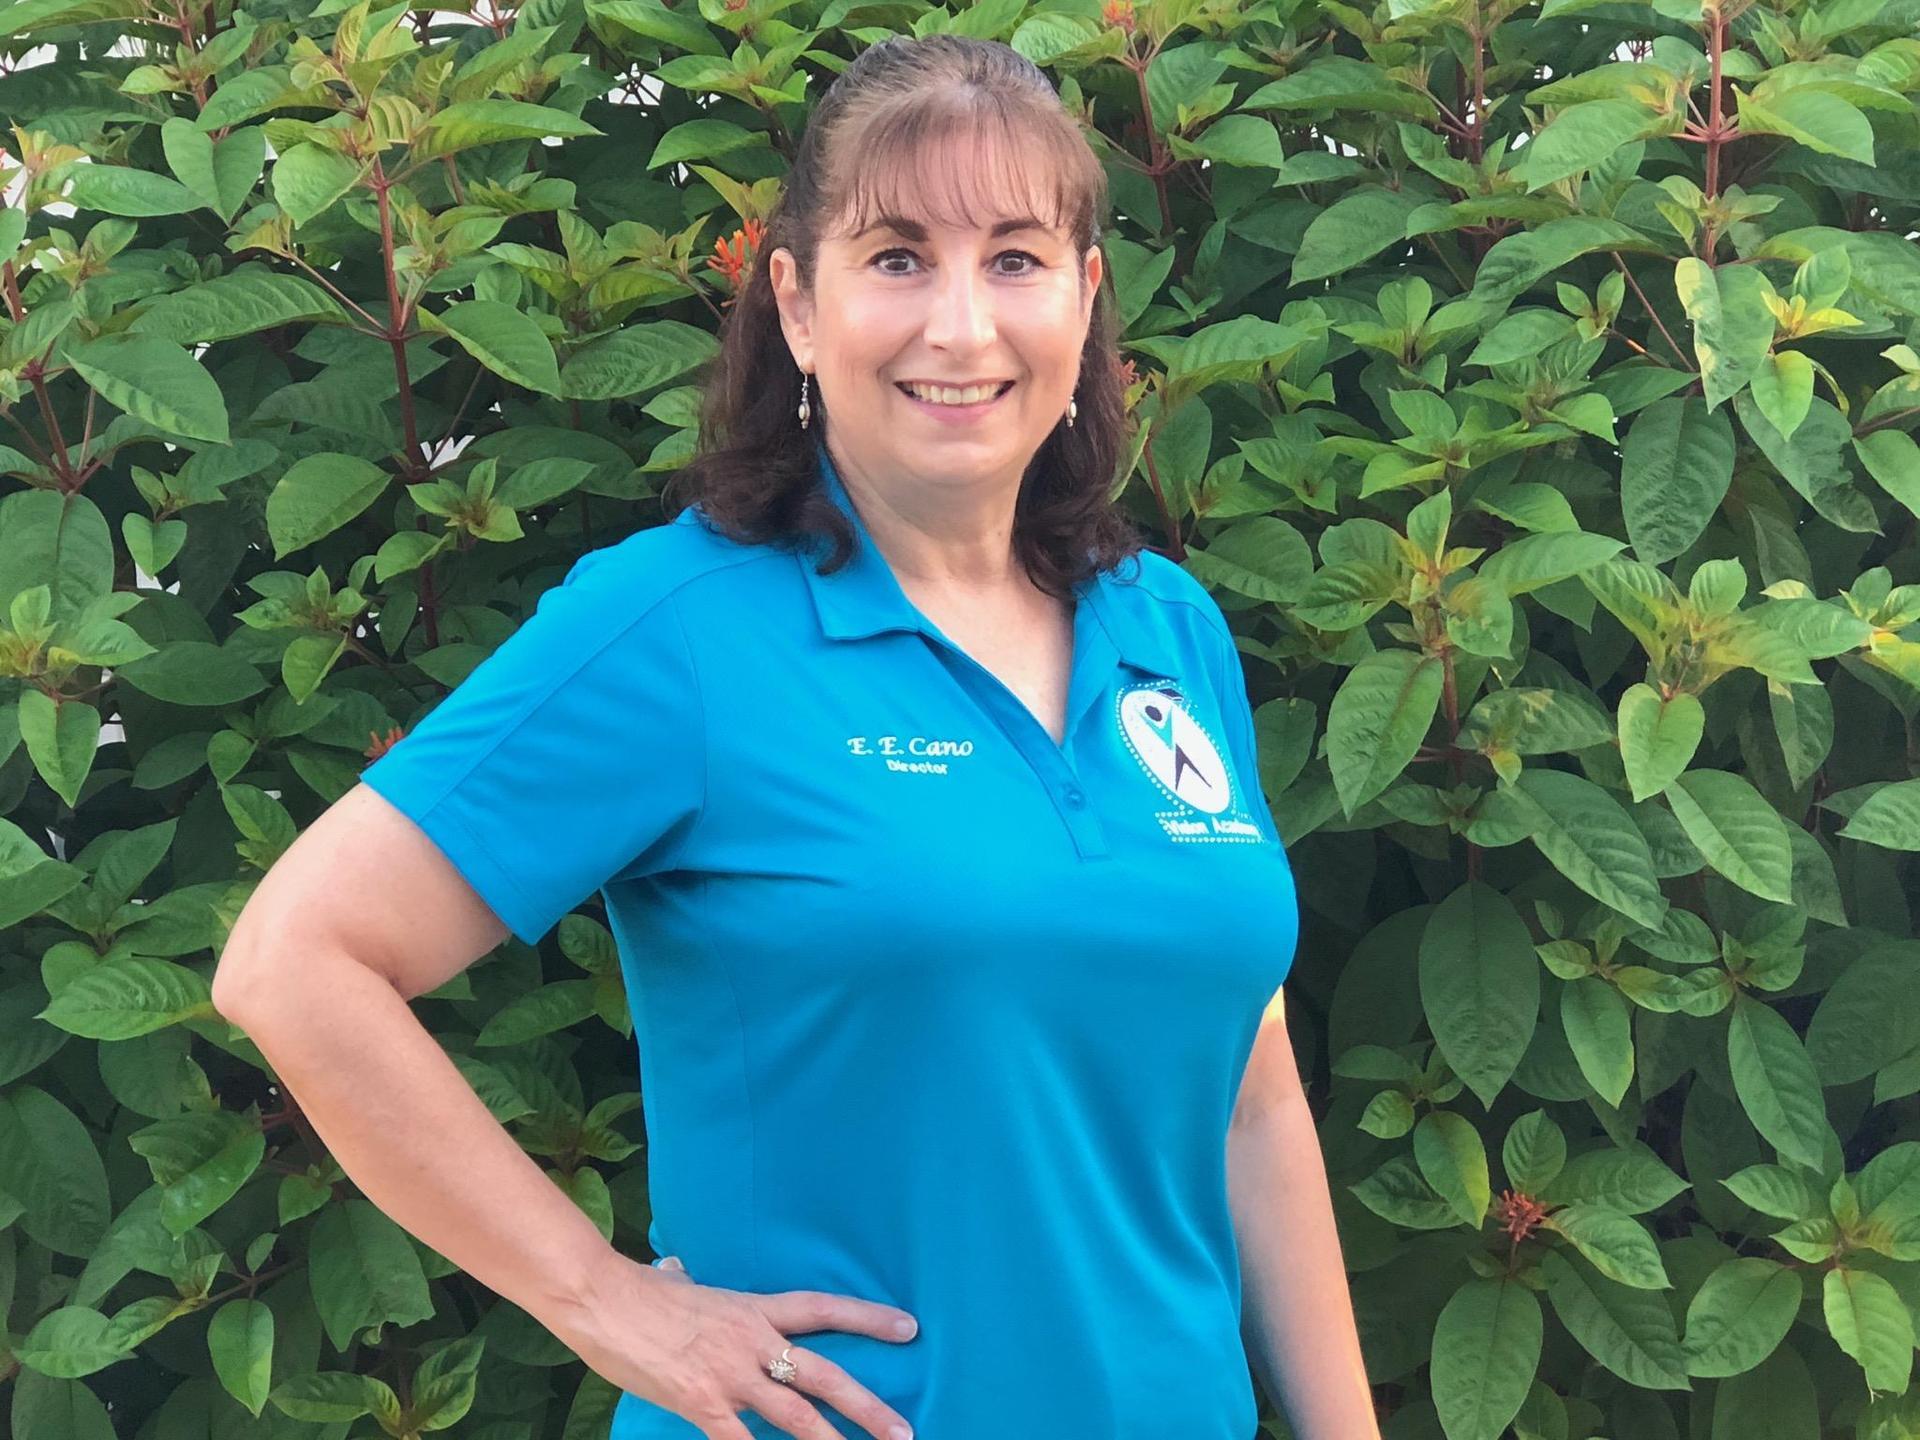 Ernestina Cano Vision School director